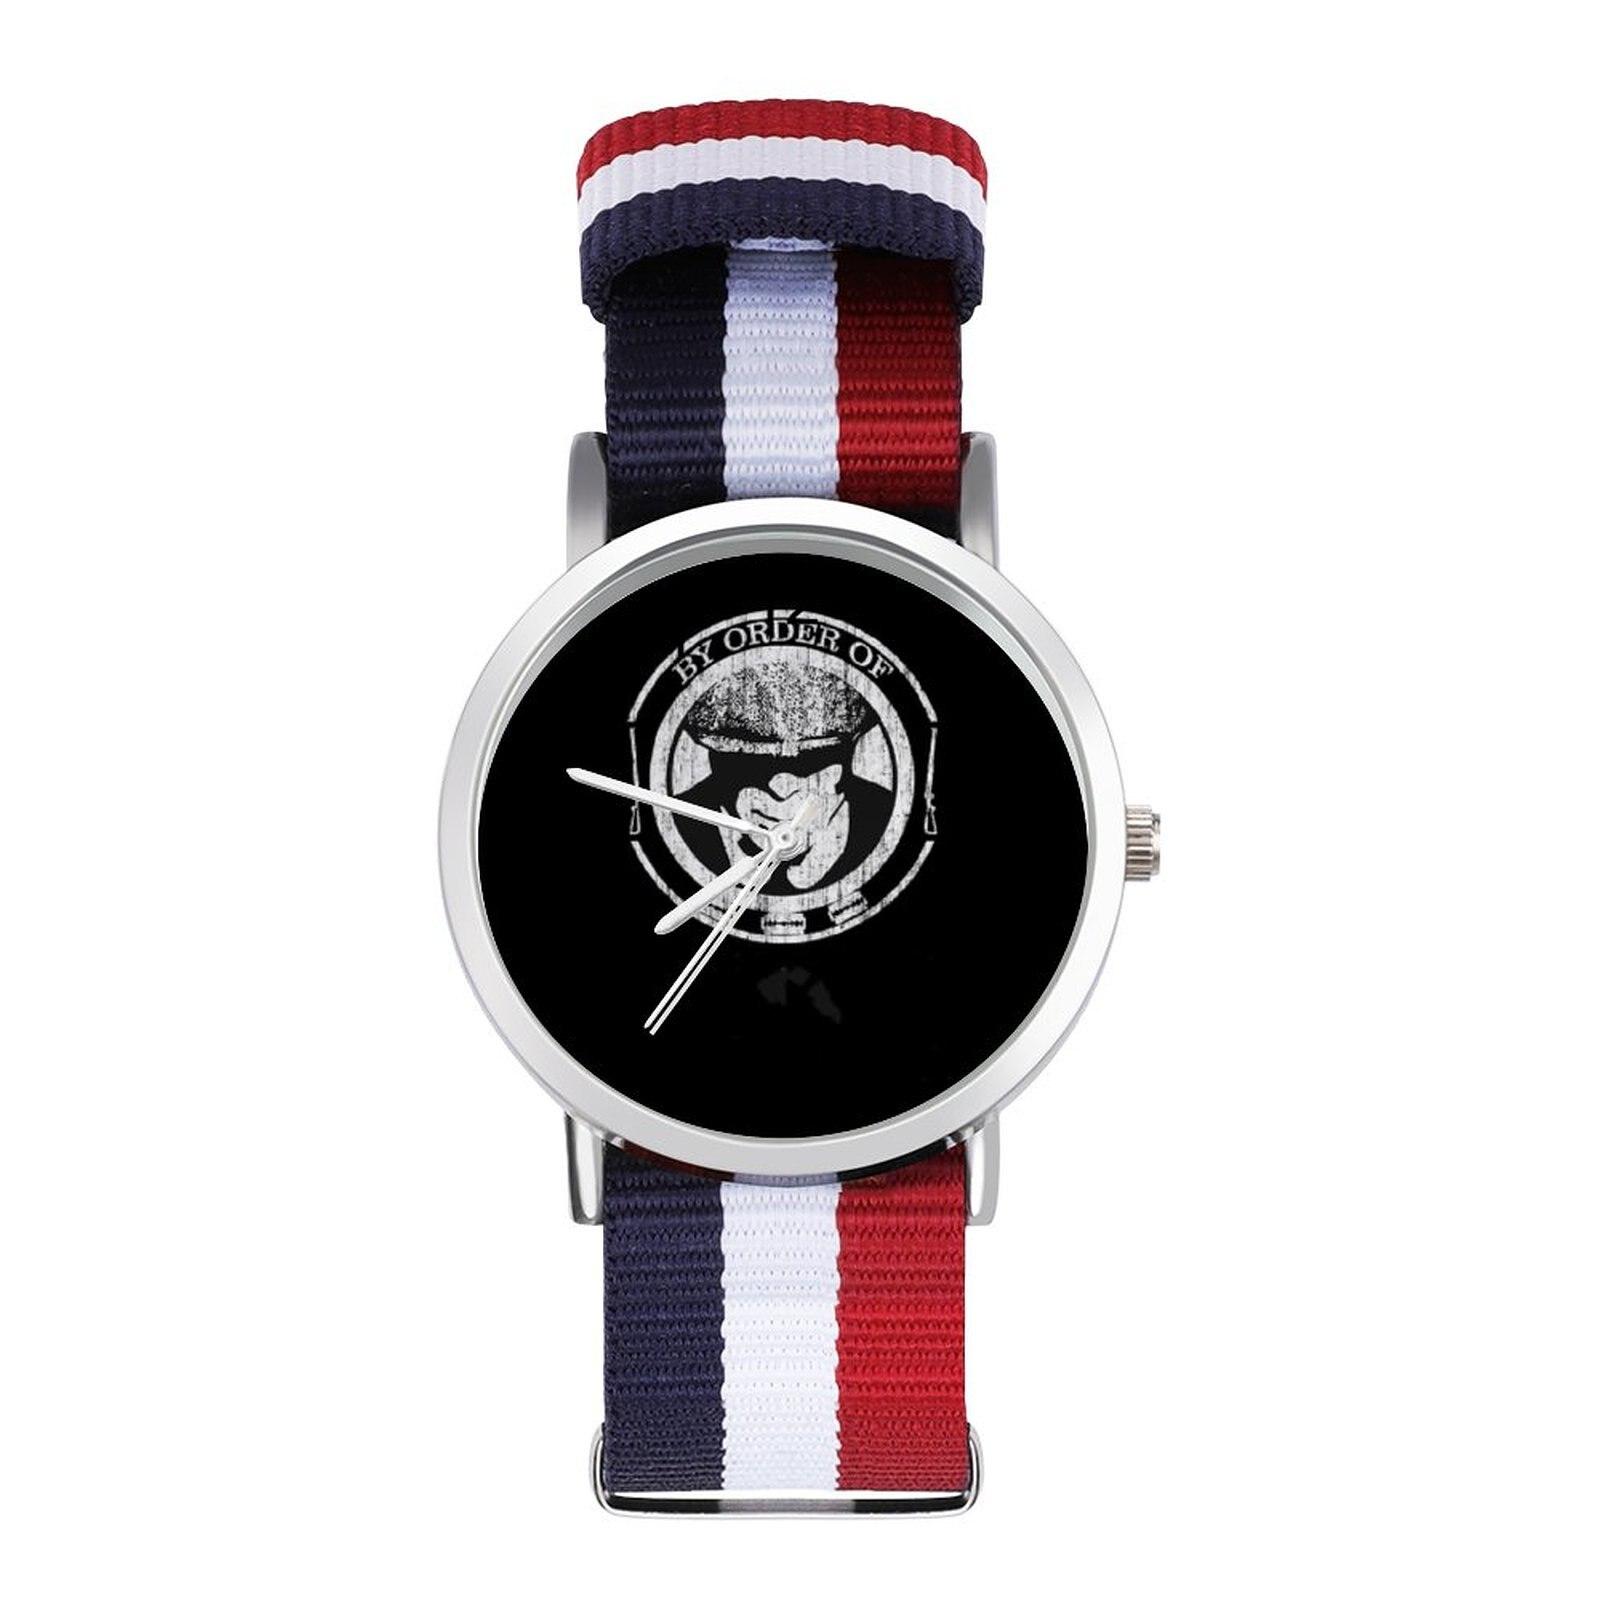 Peaky Blinder Quartz Watch Unusual Design Wrist Watch Fishing Buy Woman Wristwatch